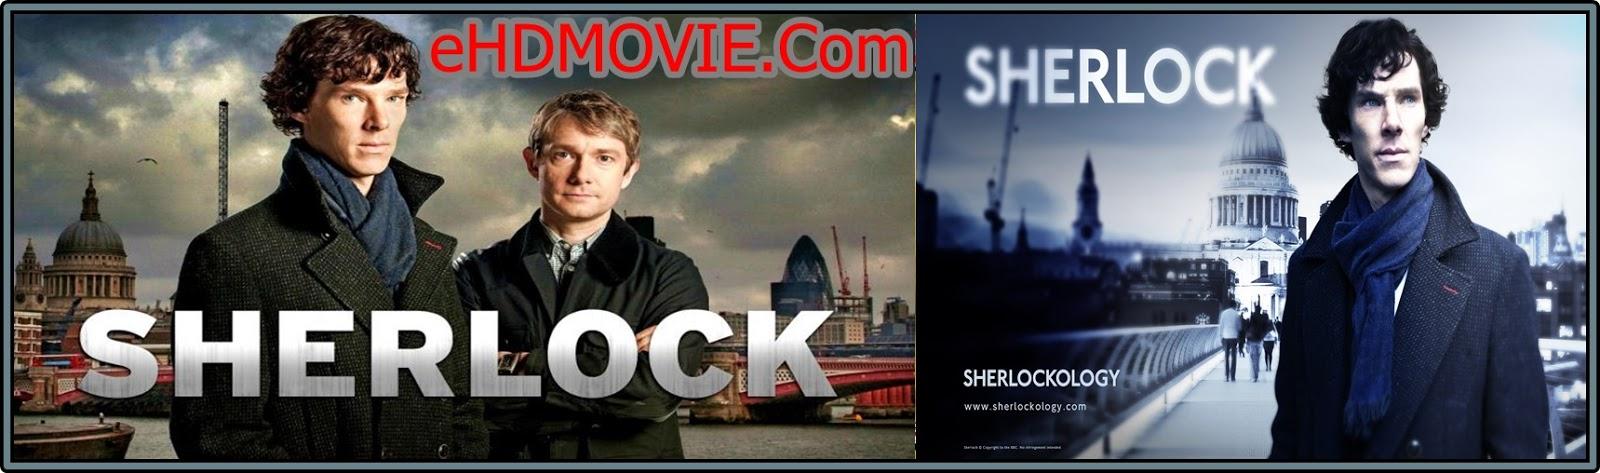 Sherlock Series 1-4 Complete English BRRip 480p & 720p